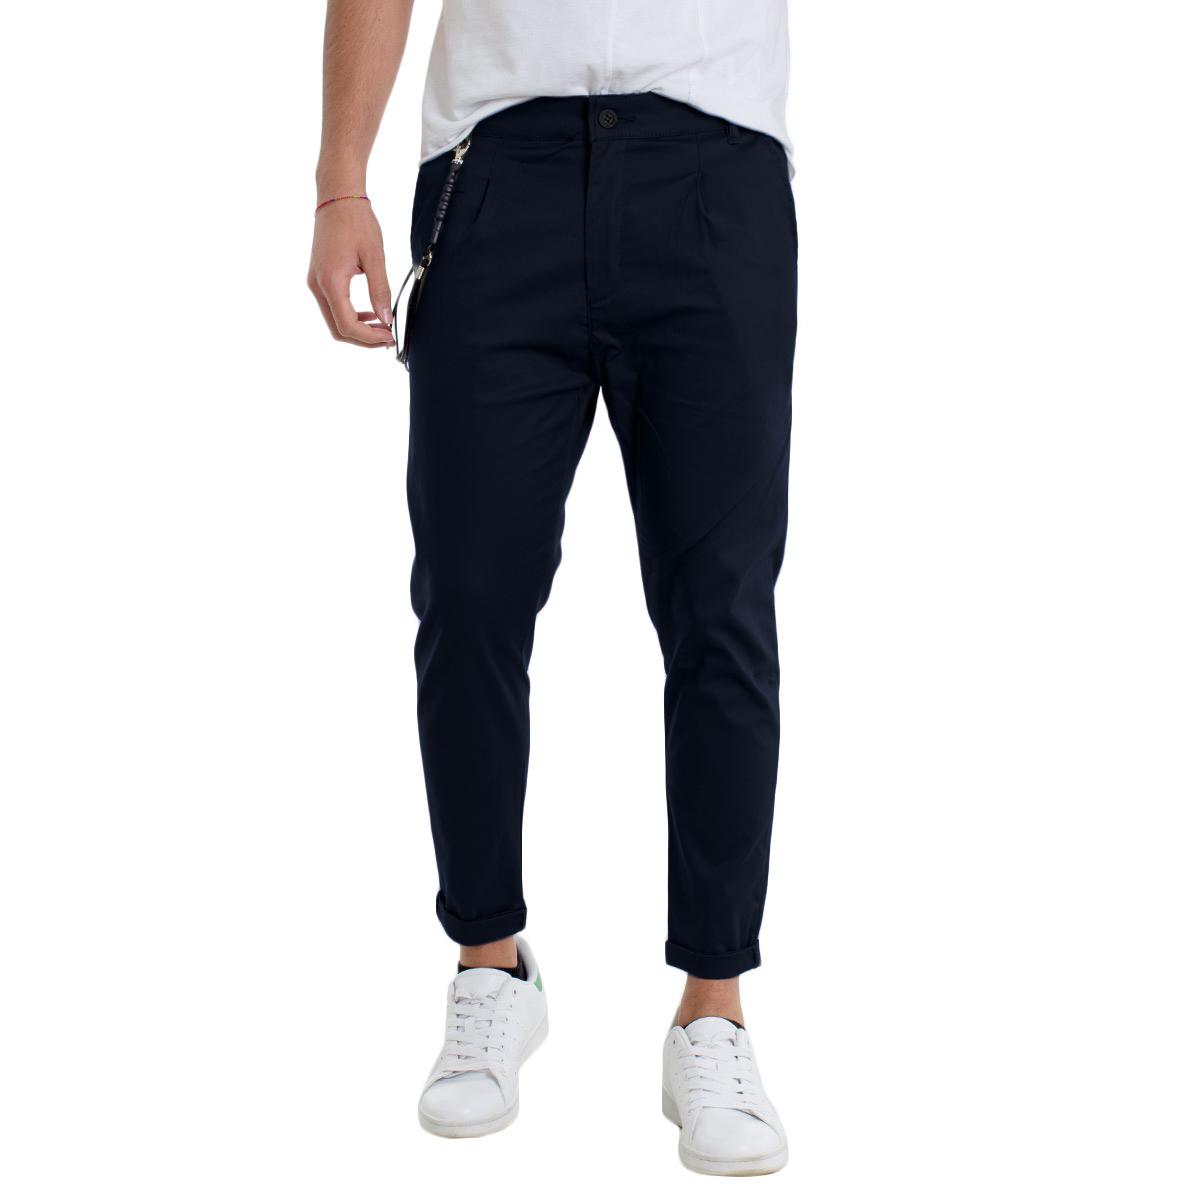 Pantalone-Uomo-Tasca-America-Cotone-Vari-Colori-Tinta-Unita-Casual-GIOSAL